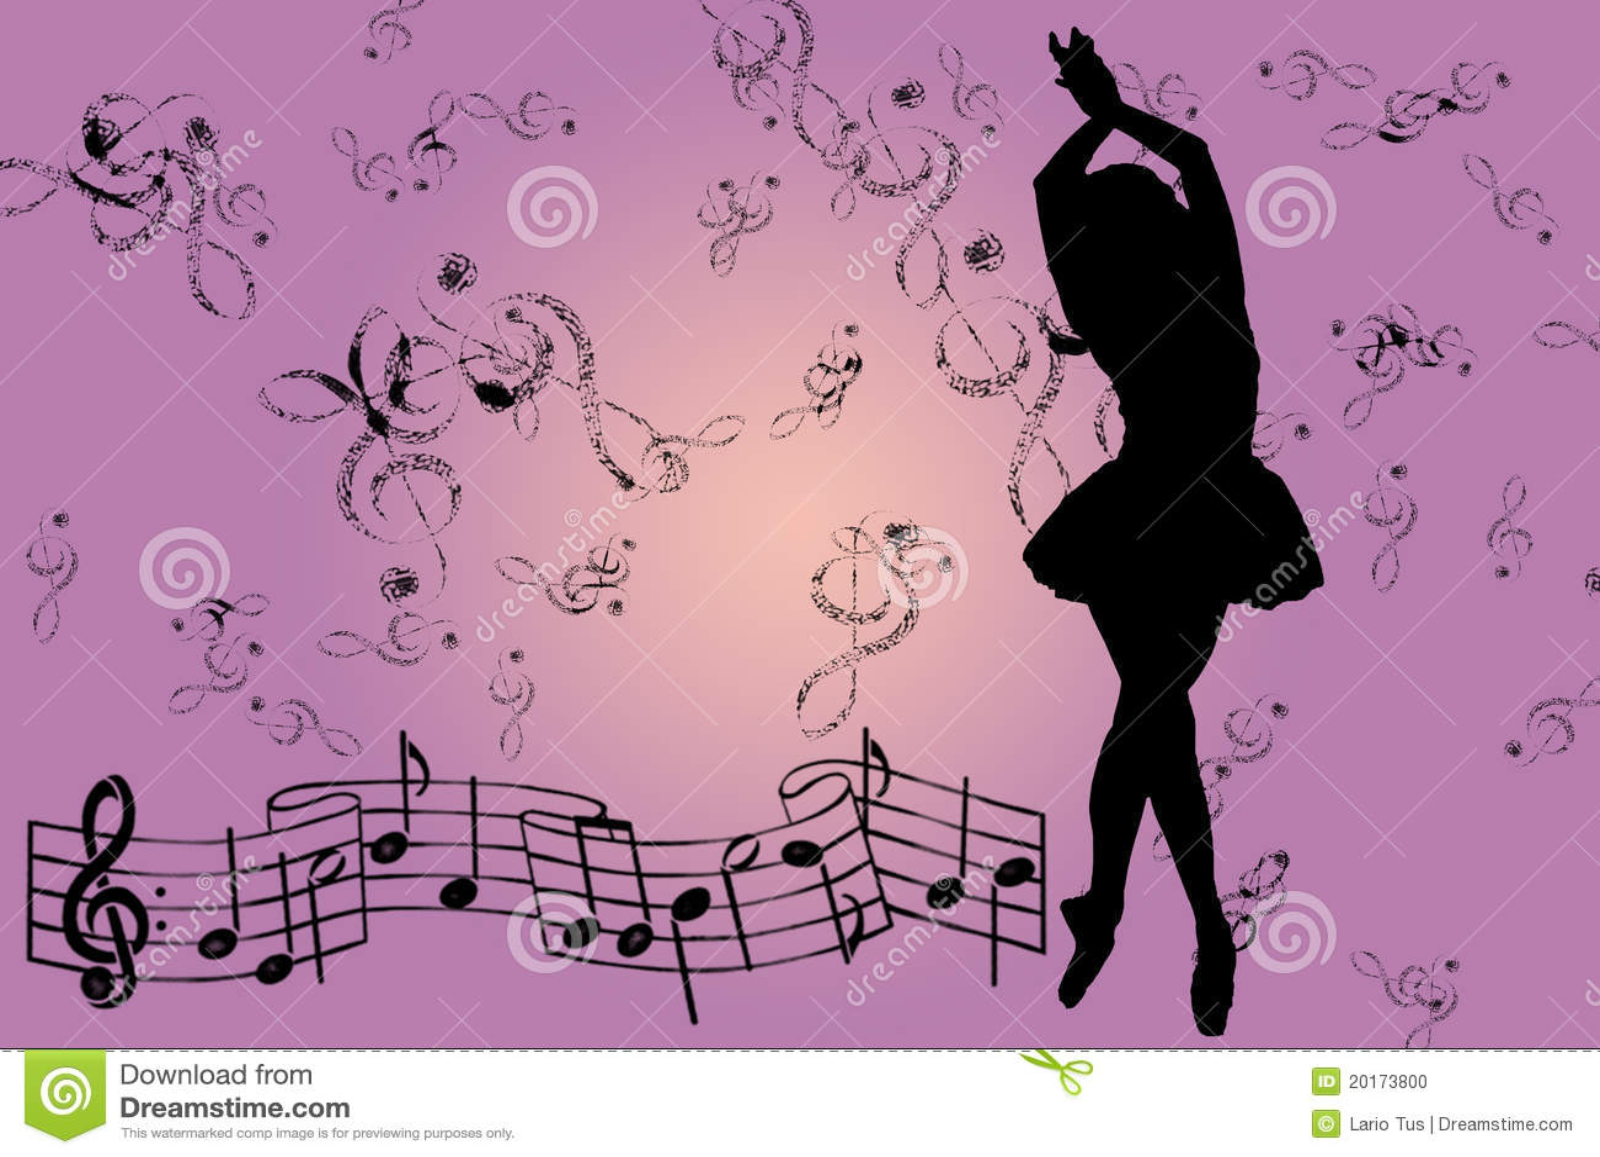 Dreams Unlimited Dance